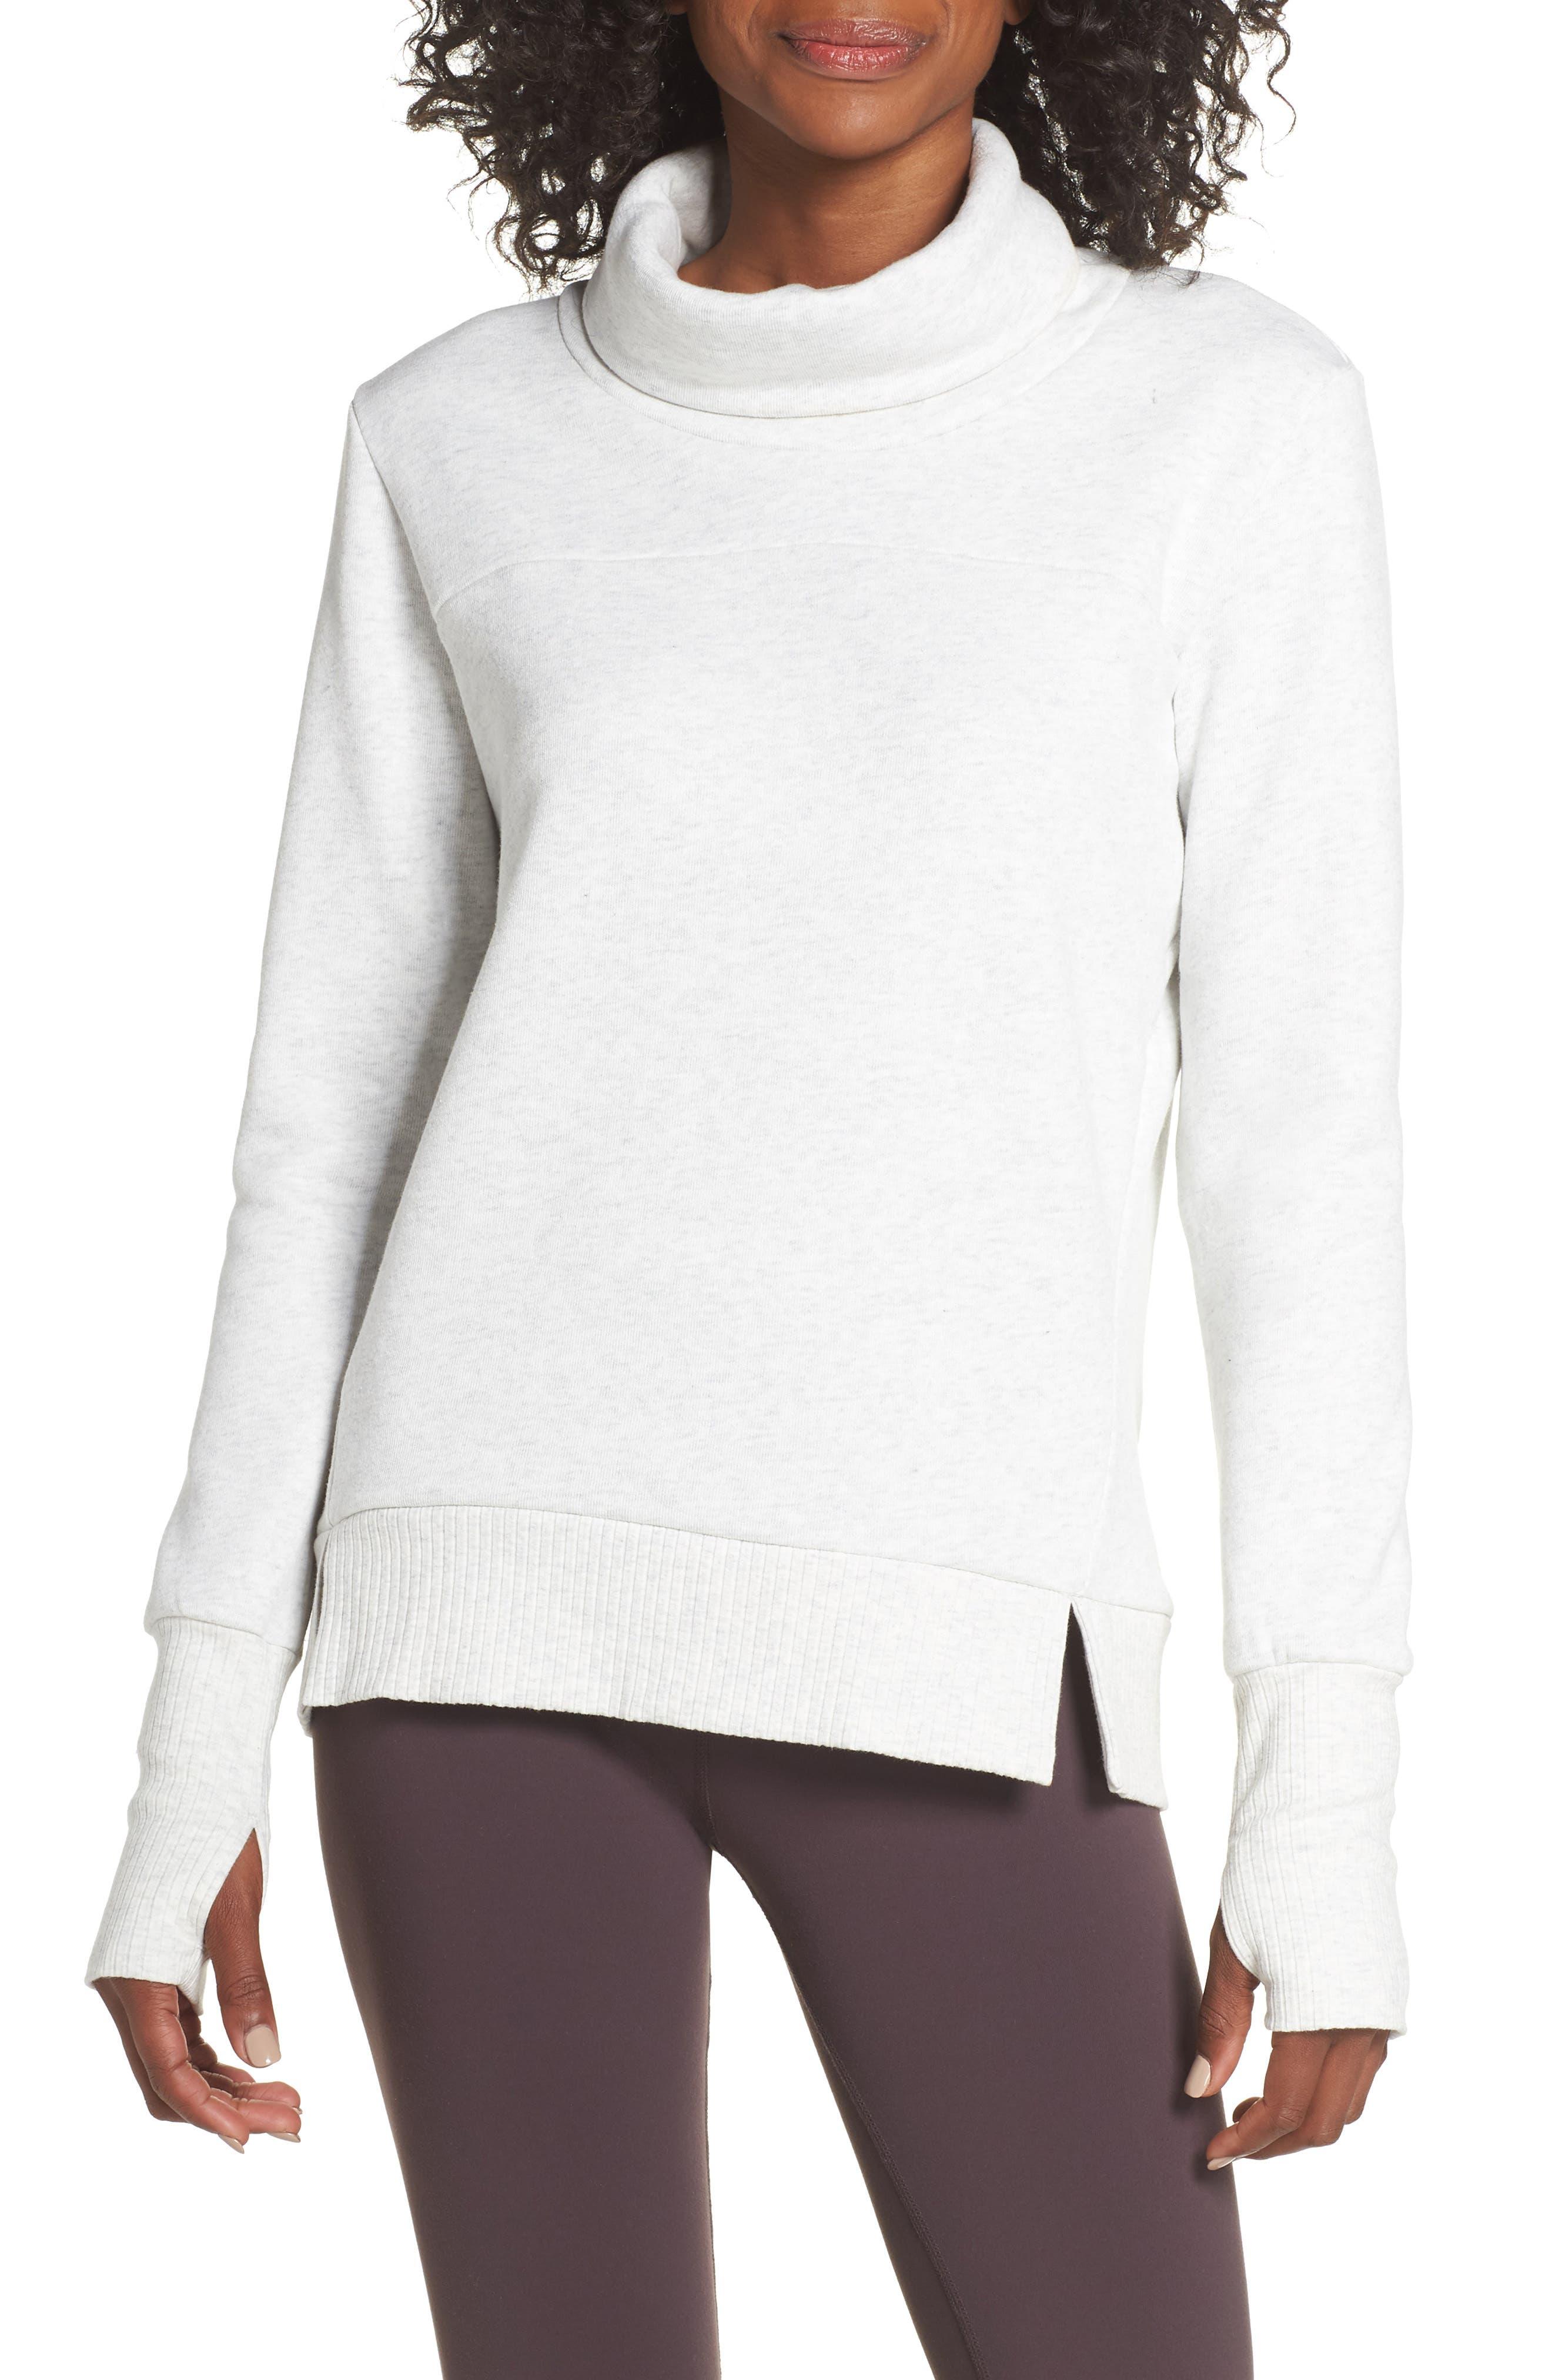 'Haze' Funnel Neck Sweatshirt,                             Main thumbnail 1, color,                             WHITE HEATHER